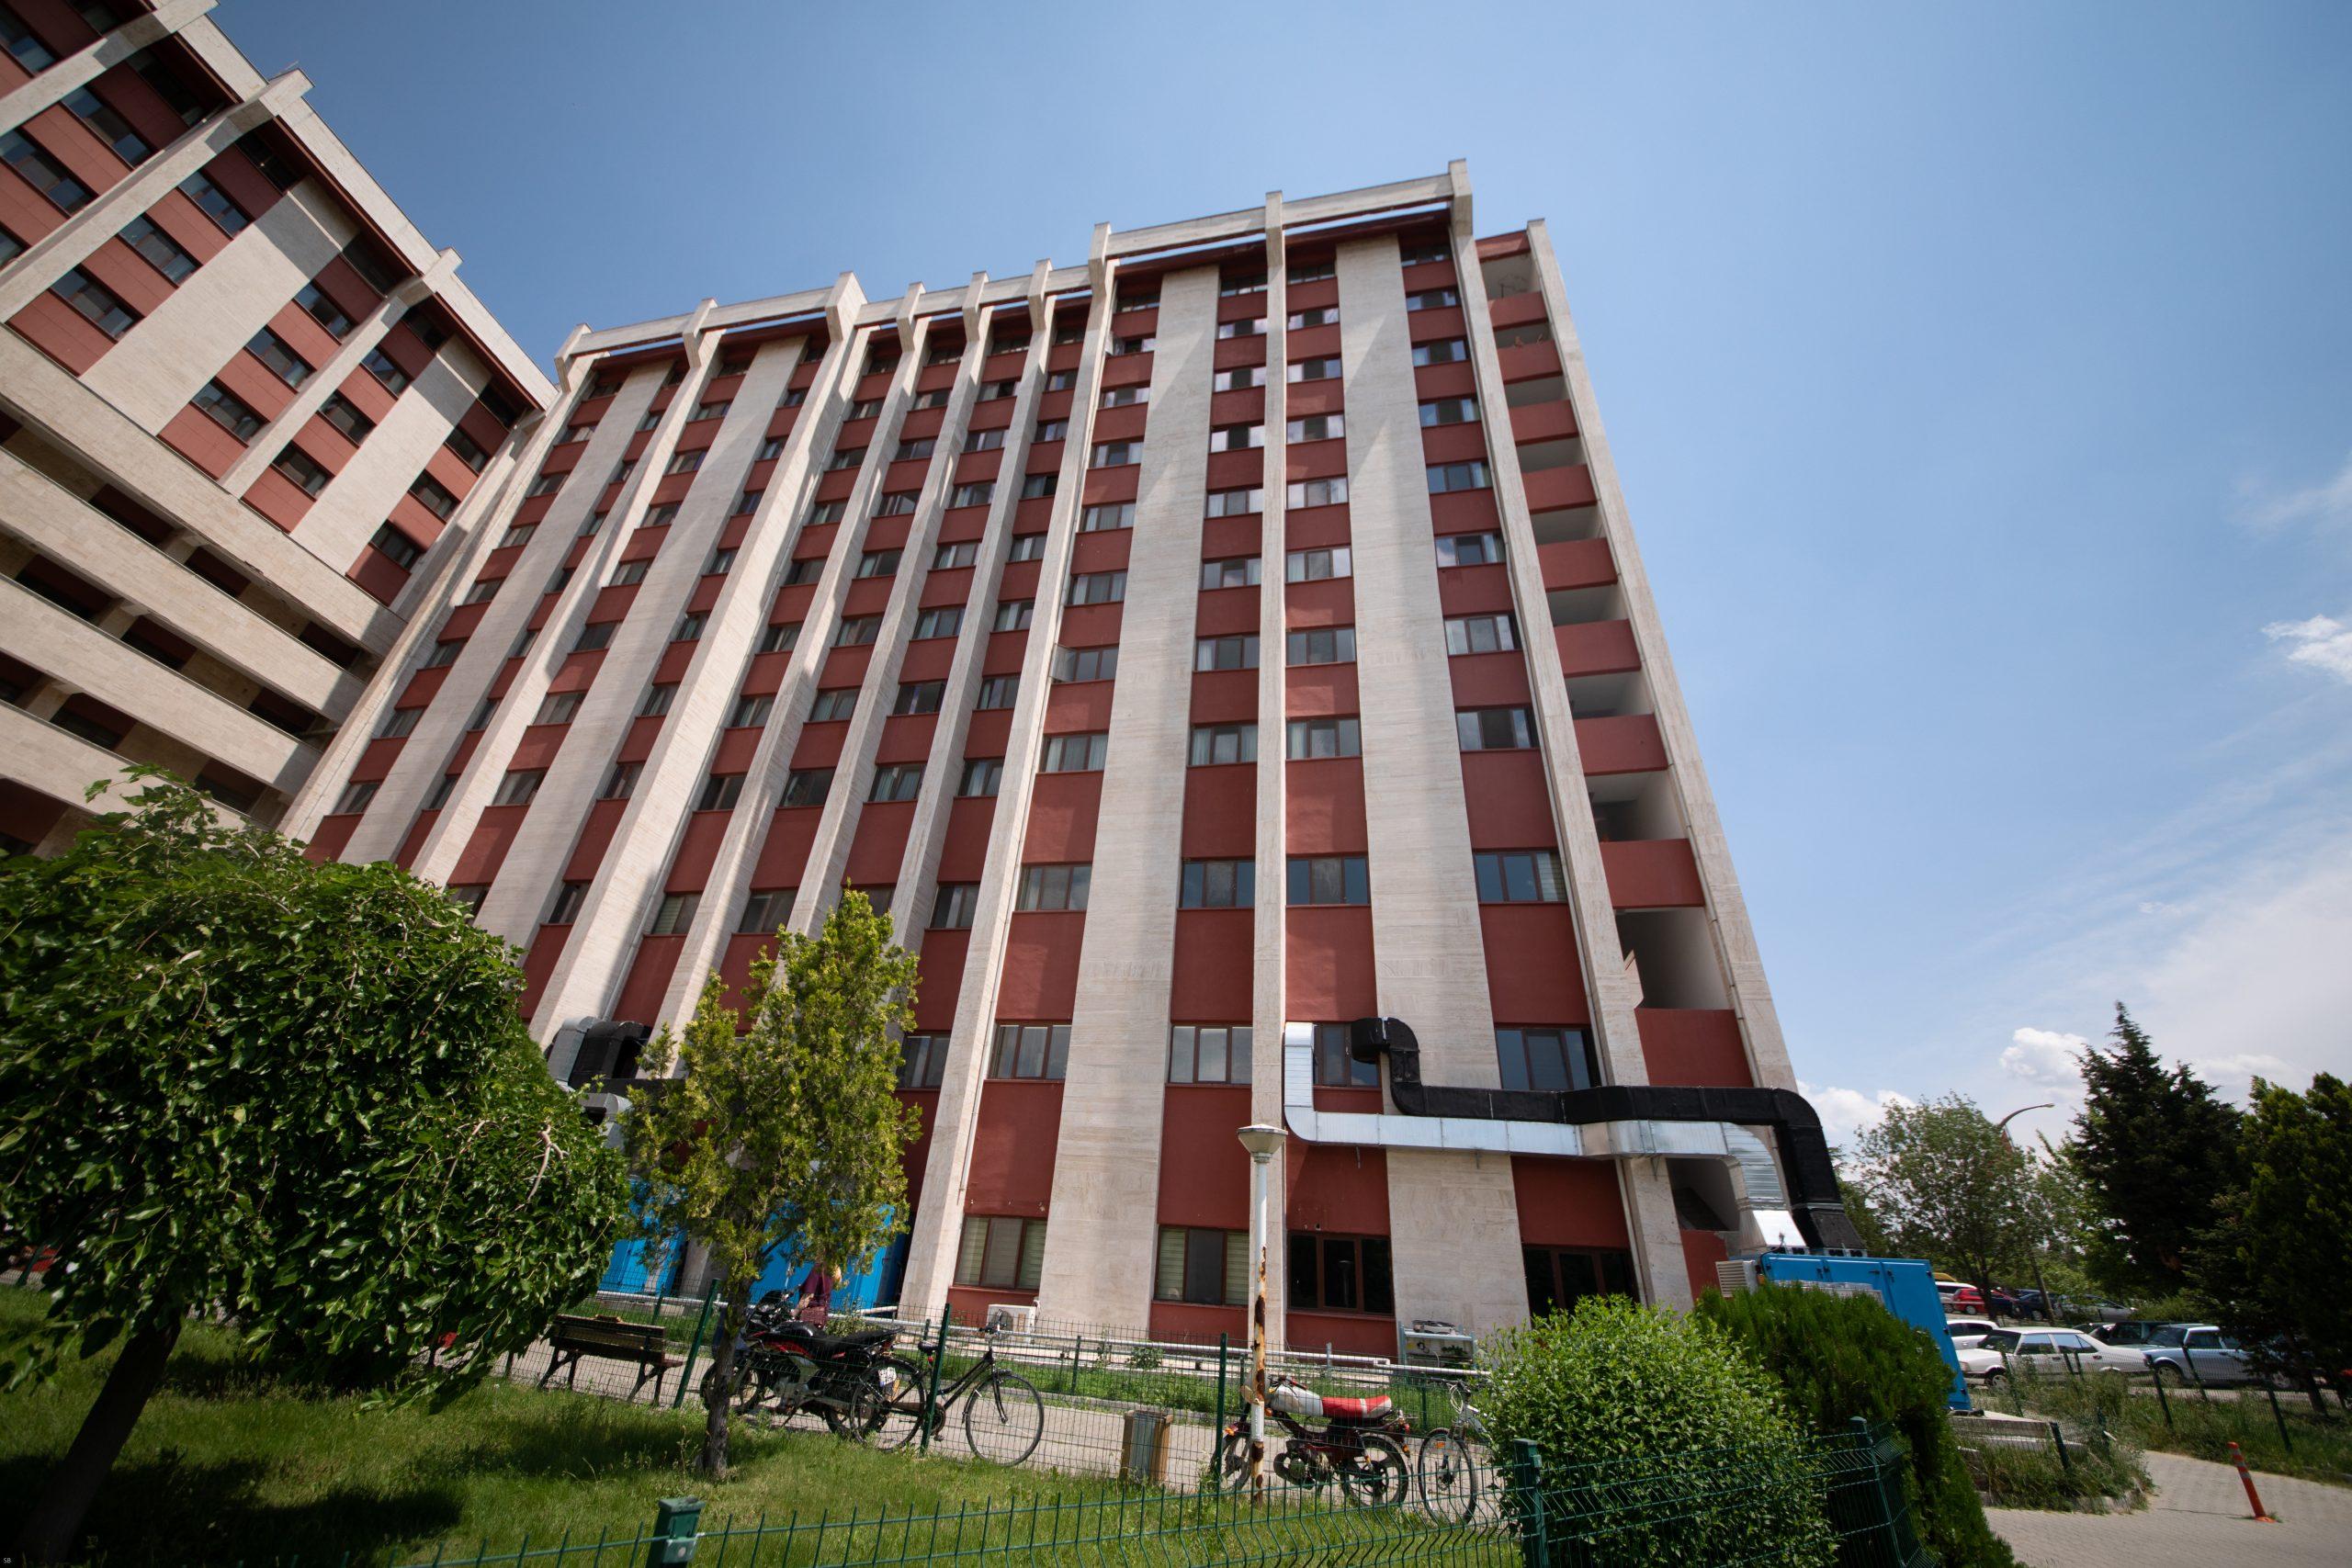 T.Ü.Tıp Fakültesi Hastanesi A2-A3-A4-A6 Blokları Onarımı İşi